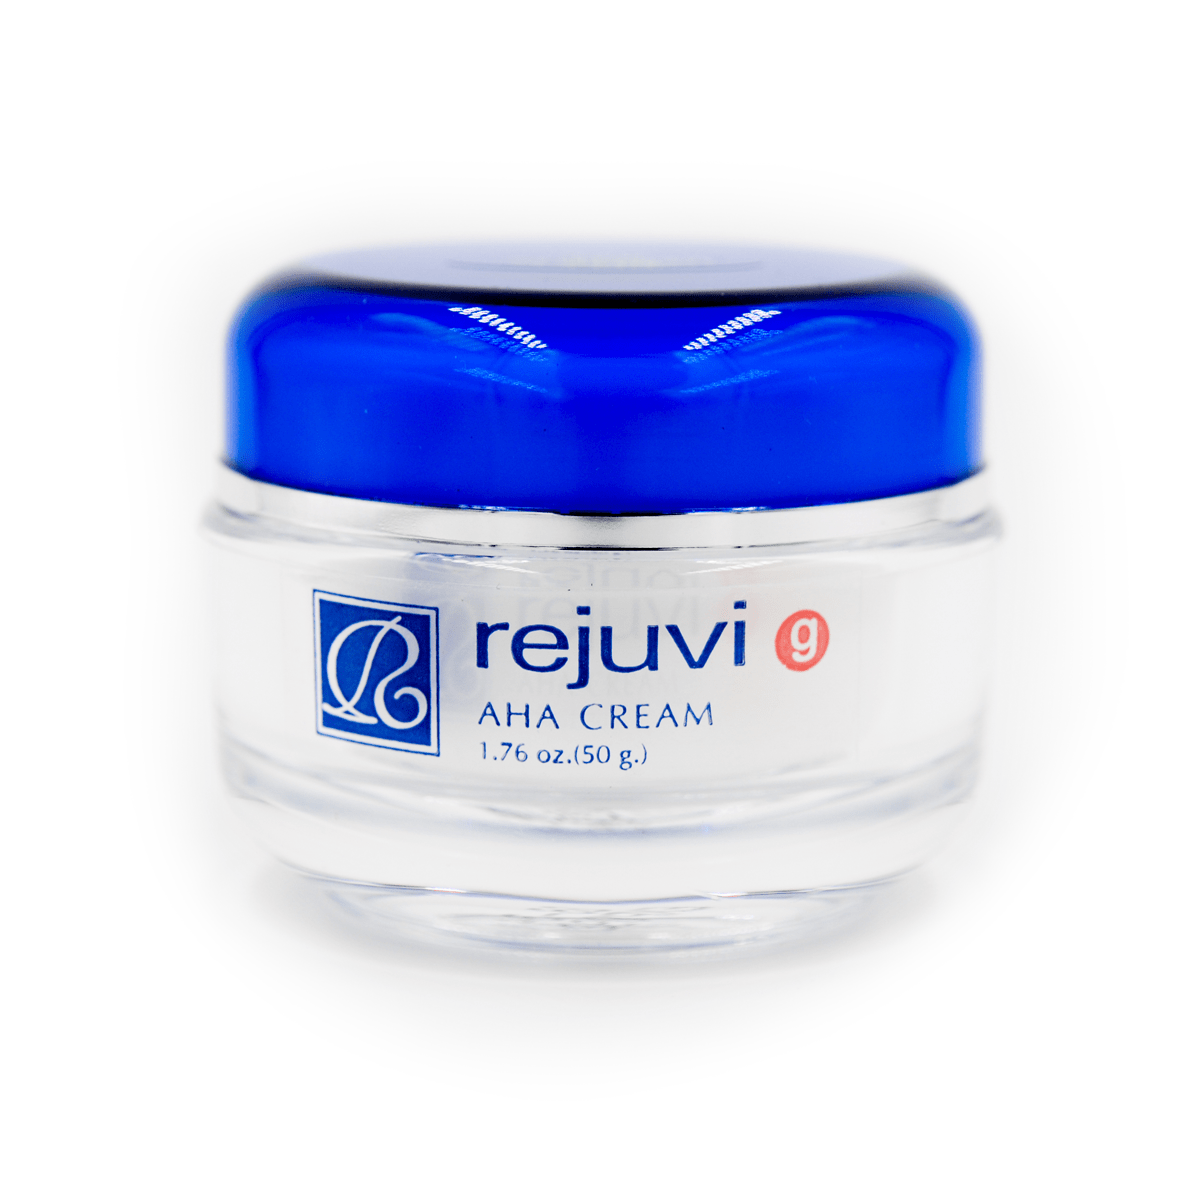 g AHA Cream (Sensitive Skin) 1.76 oz/50g